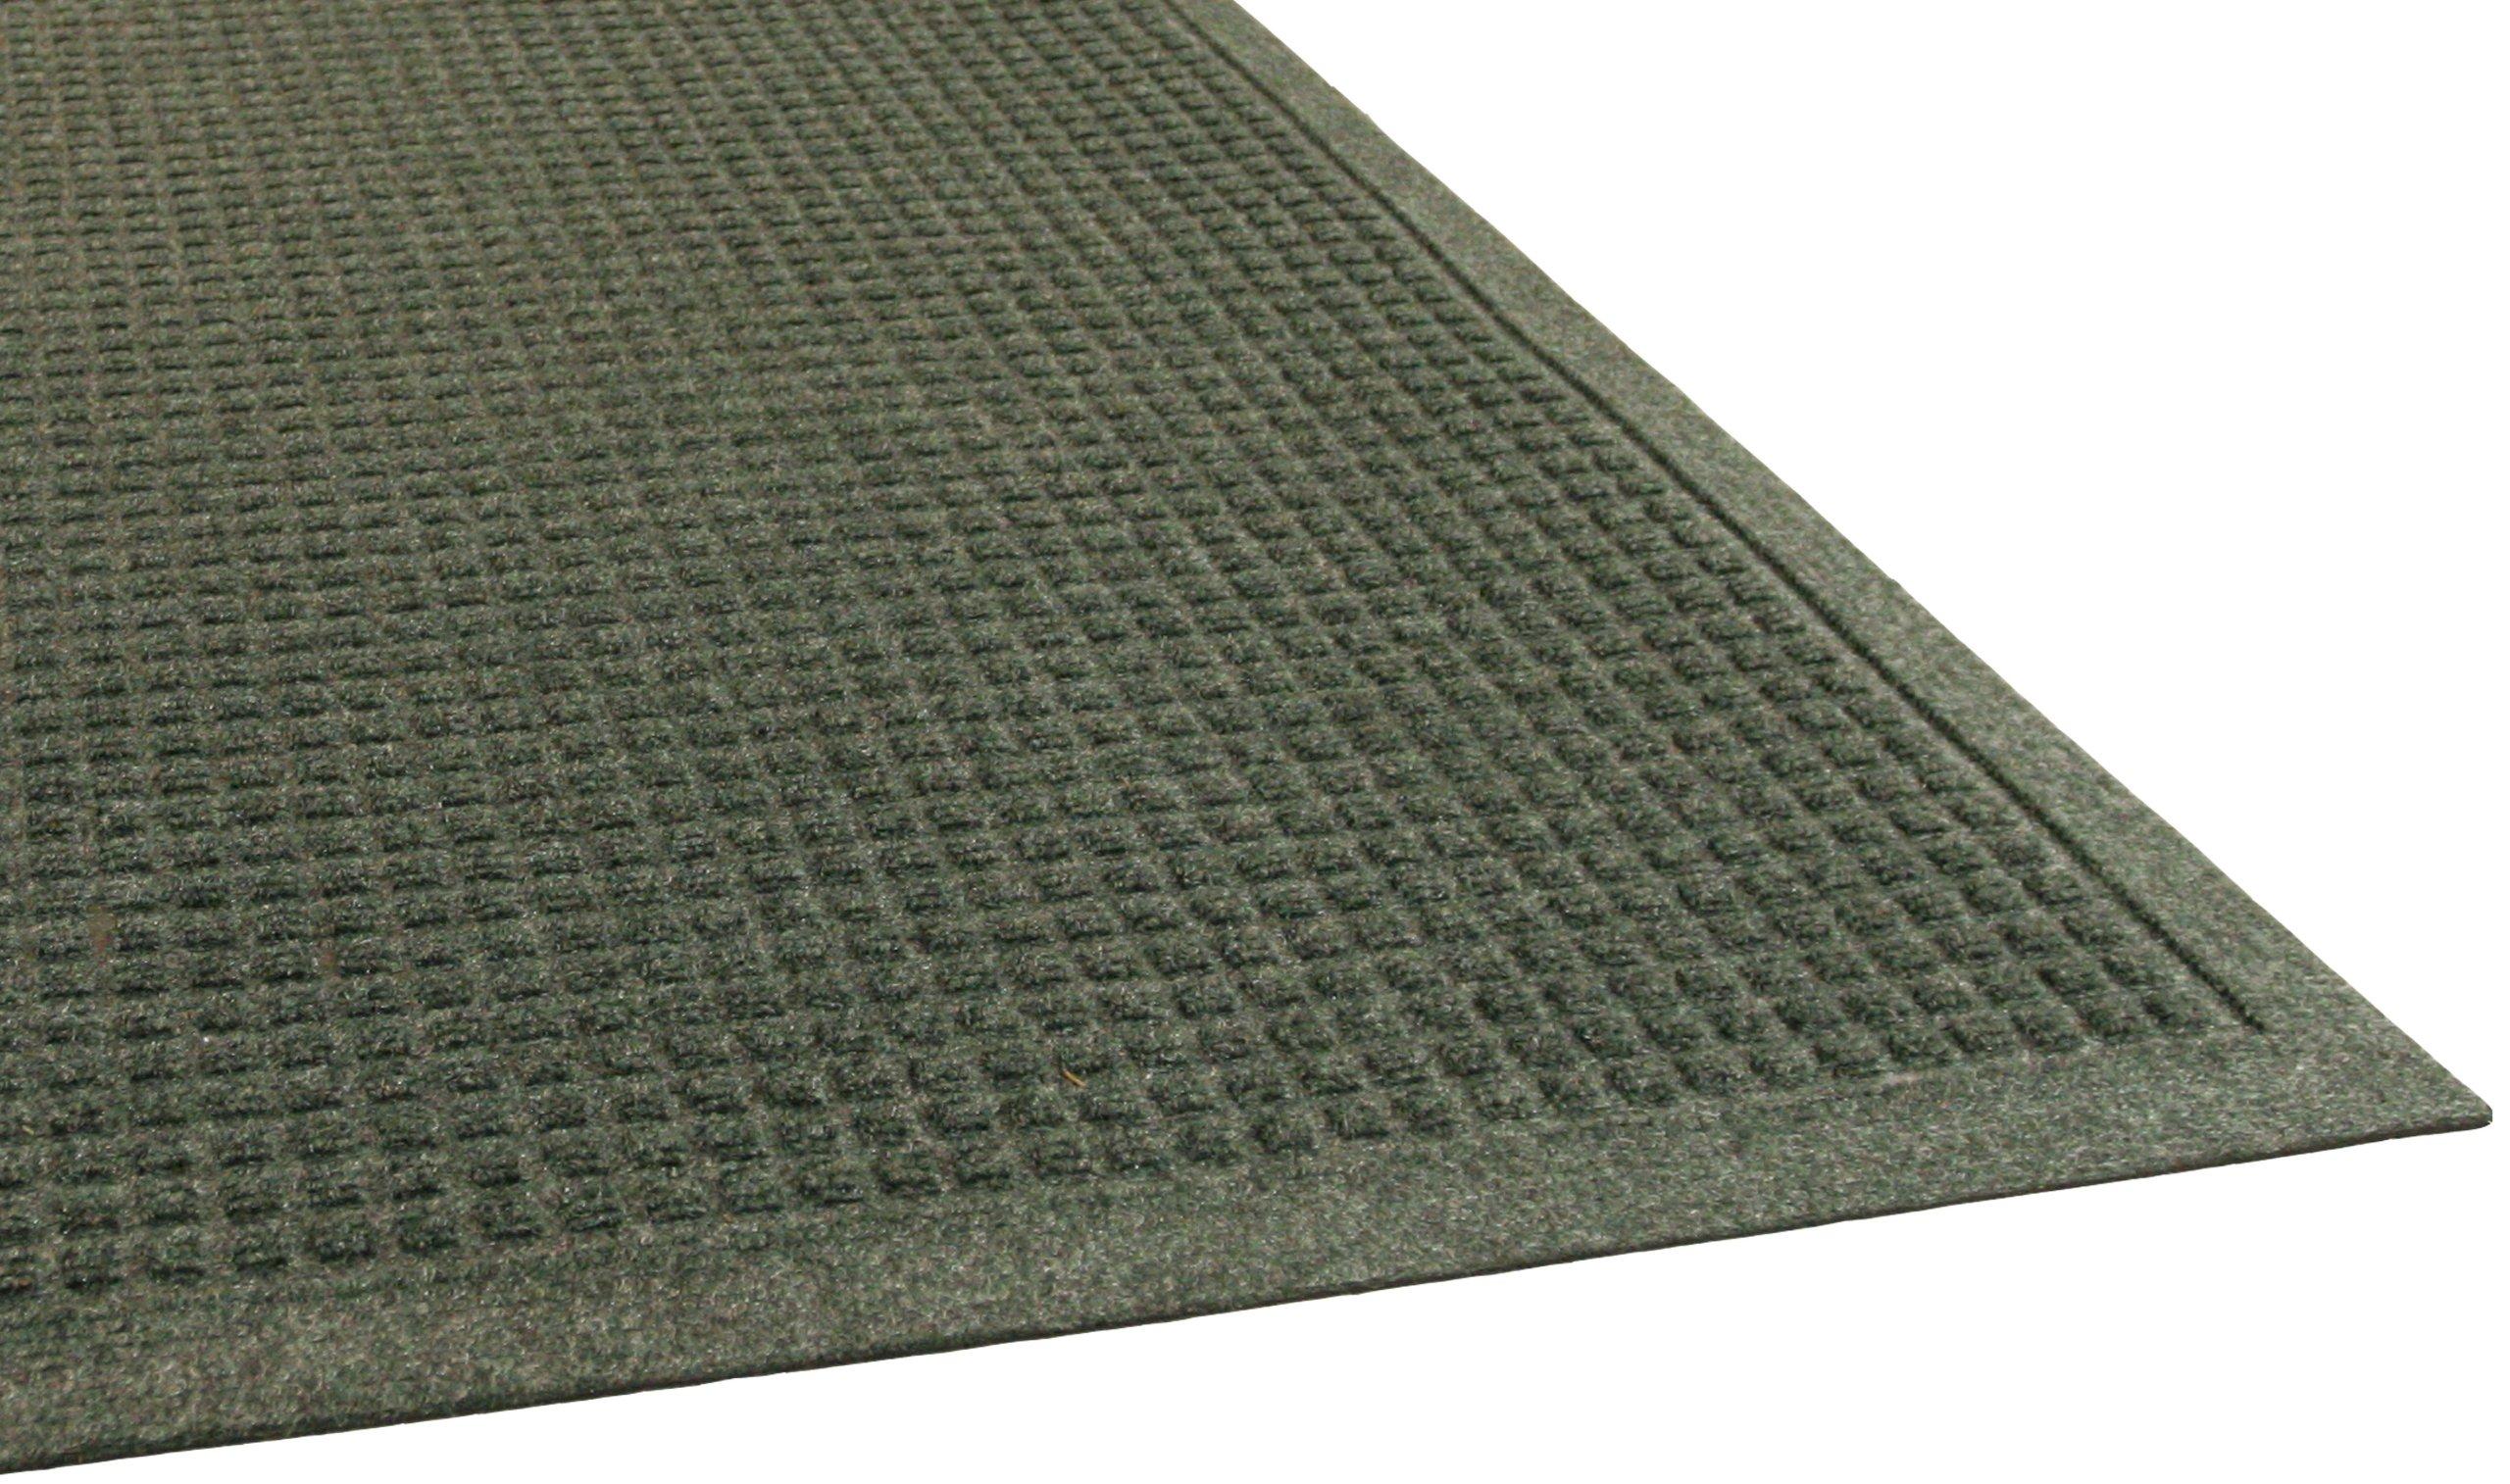 Guardian EcoGuard Indoor Wiper Floor Mat, Recycled Plastic and Rubber, 3' x 4', Green